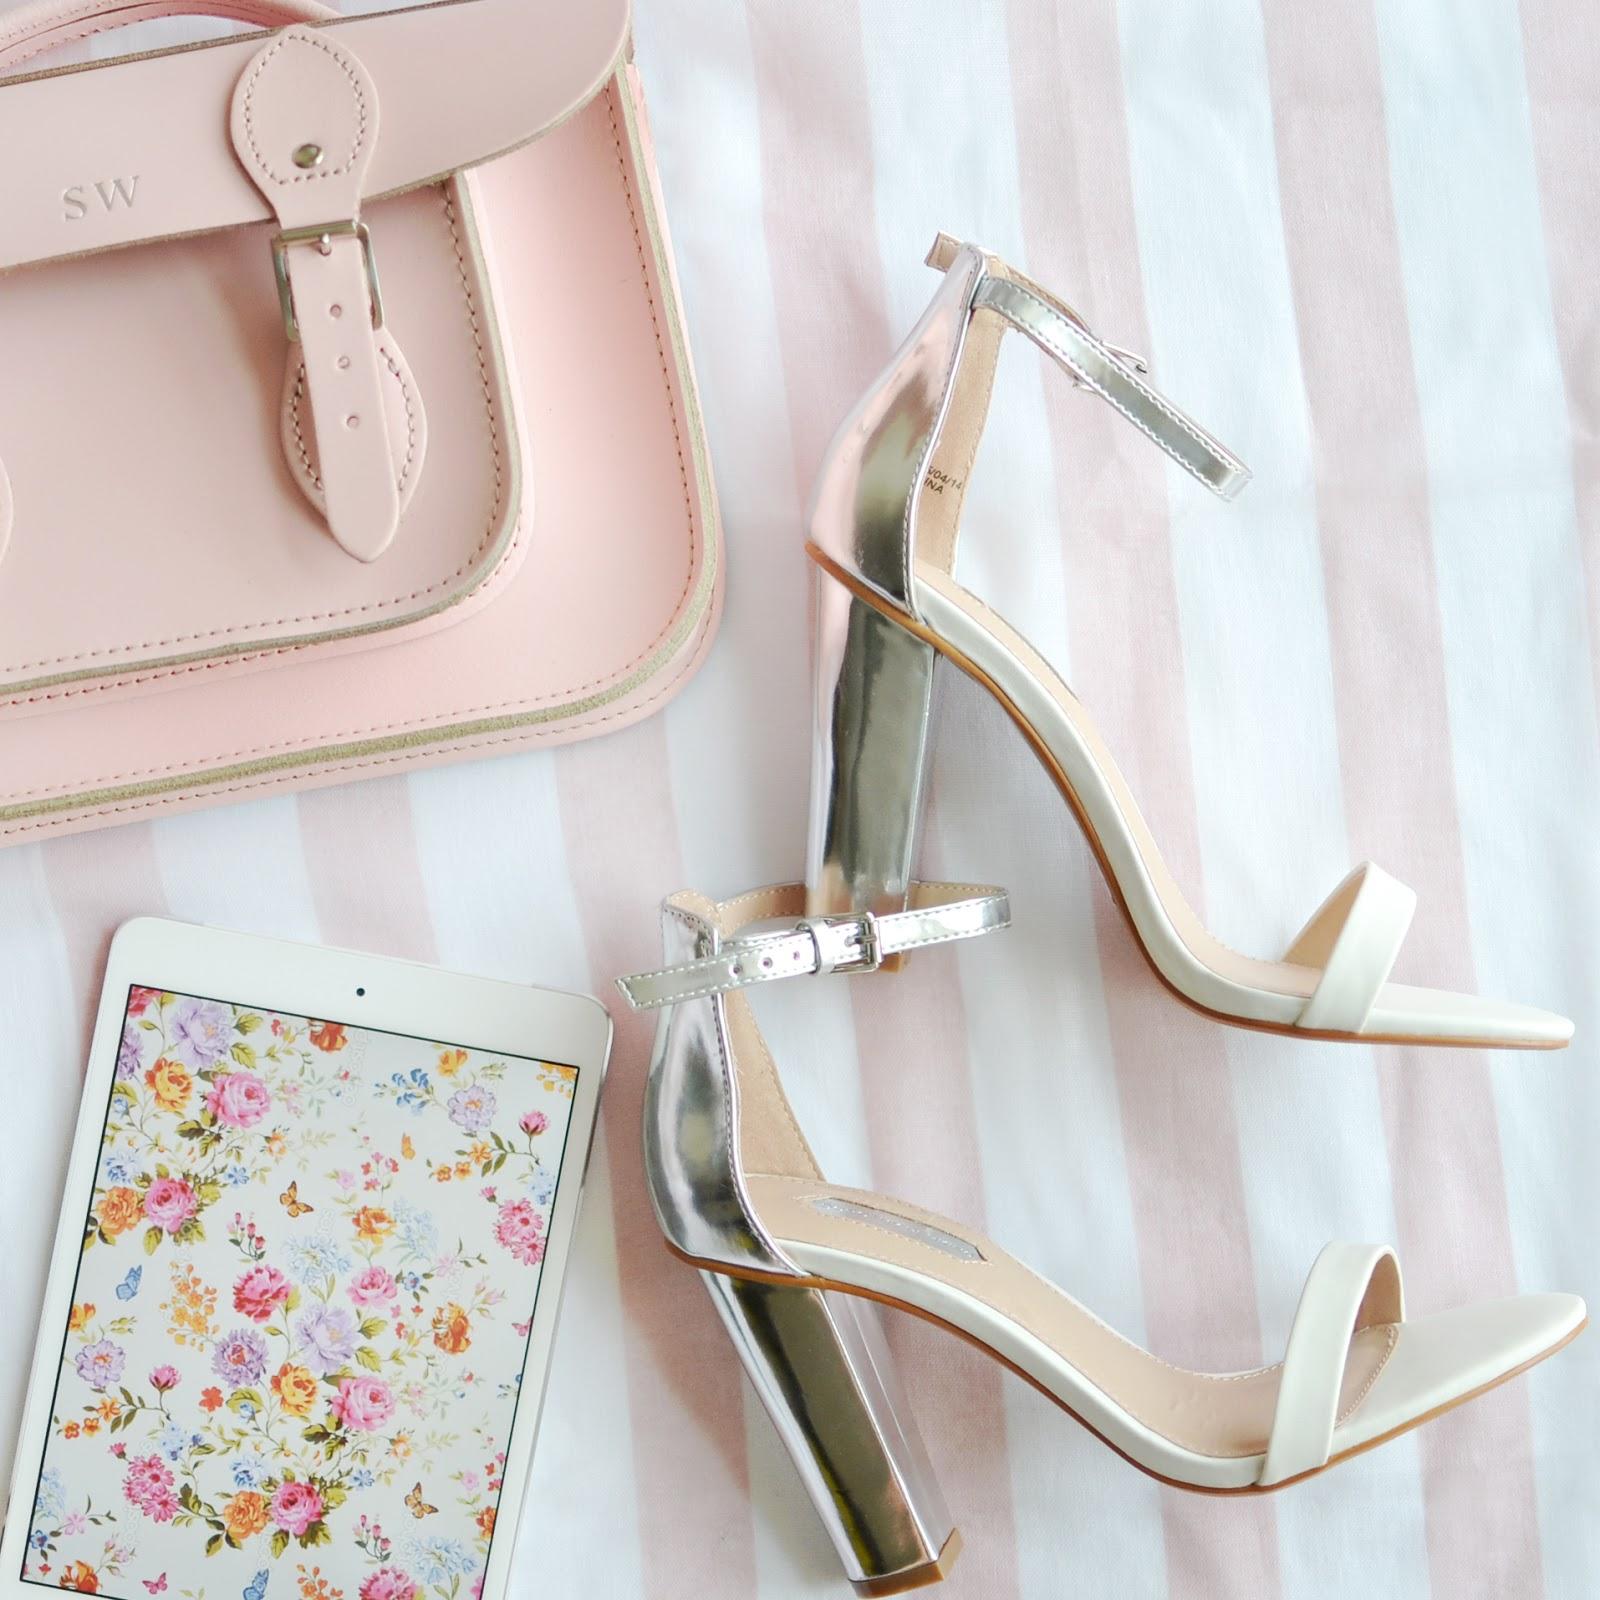 Temporary:Secretary UK Fashion Blog | Style Blogger: Heeled Sandals from House Of Fraser Under £30!